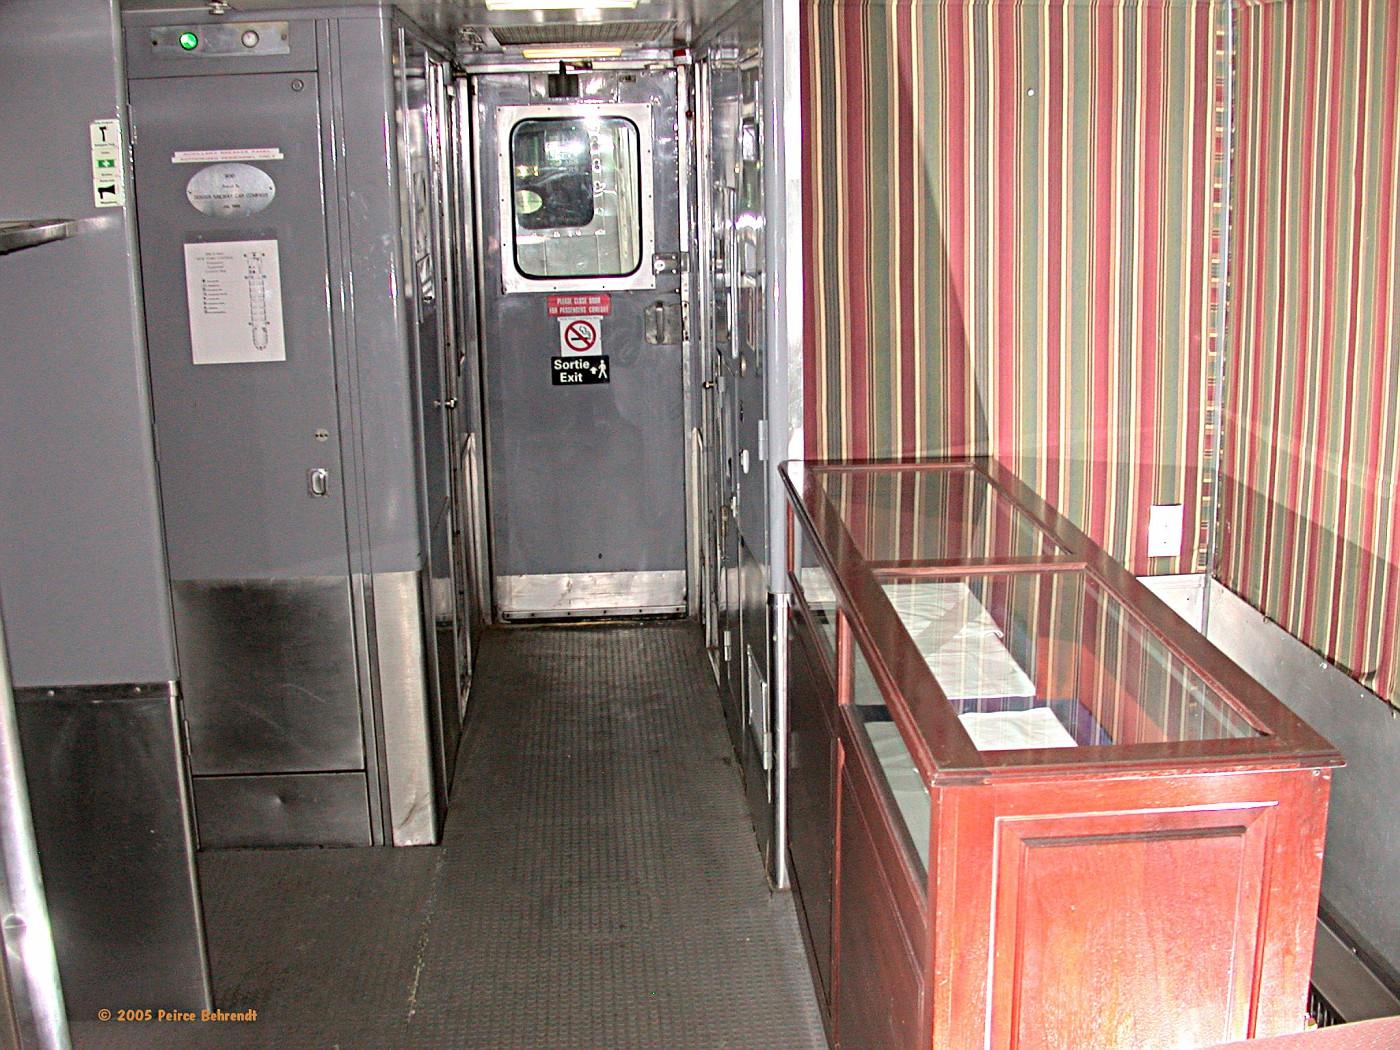 Parlor-observation interior 3